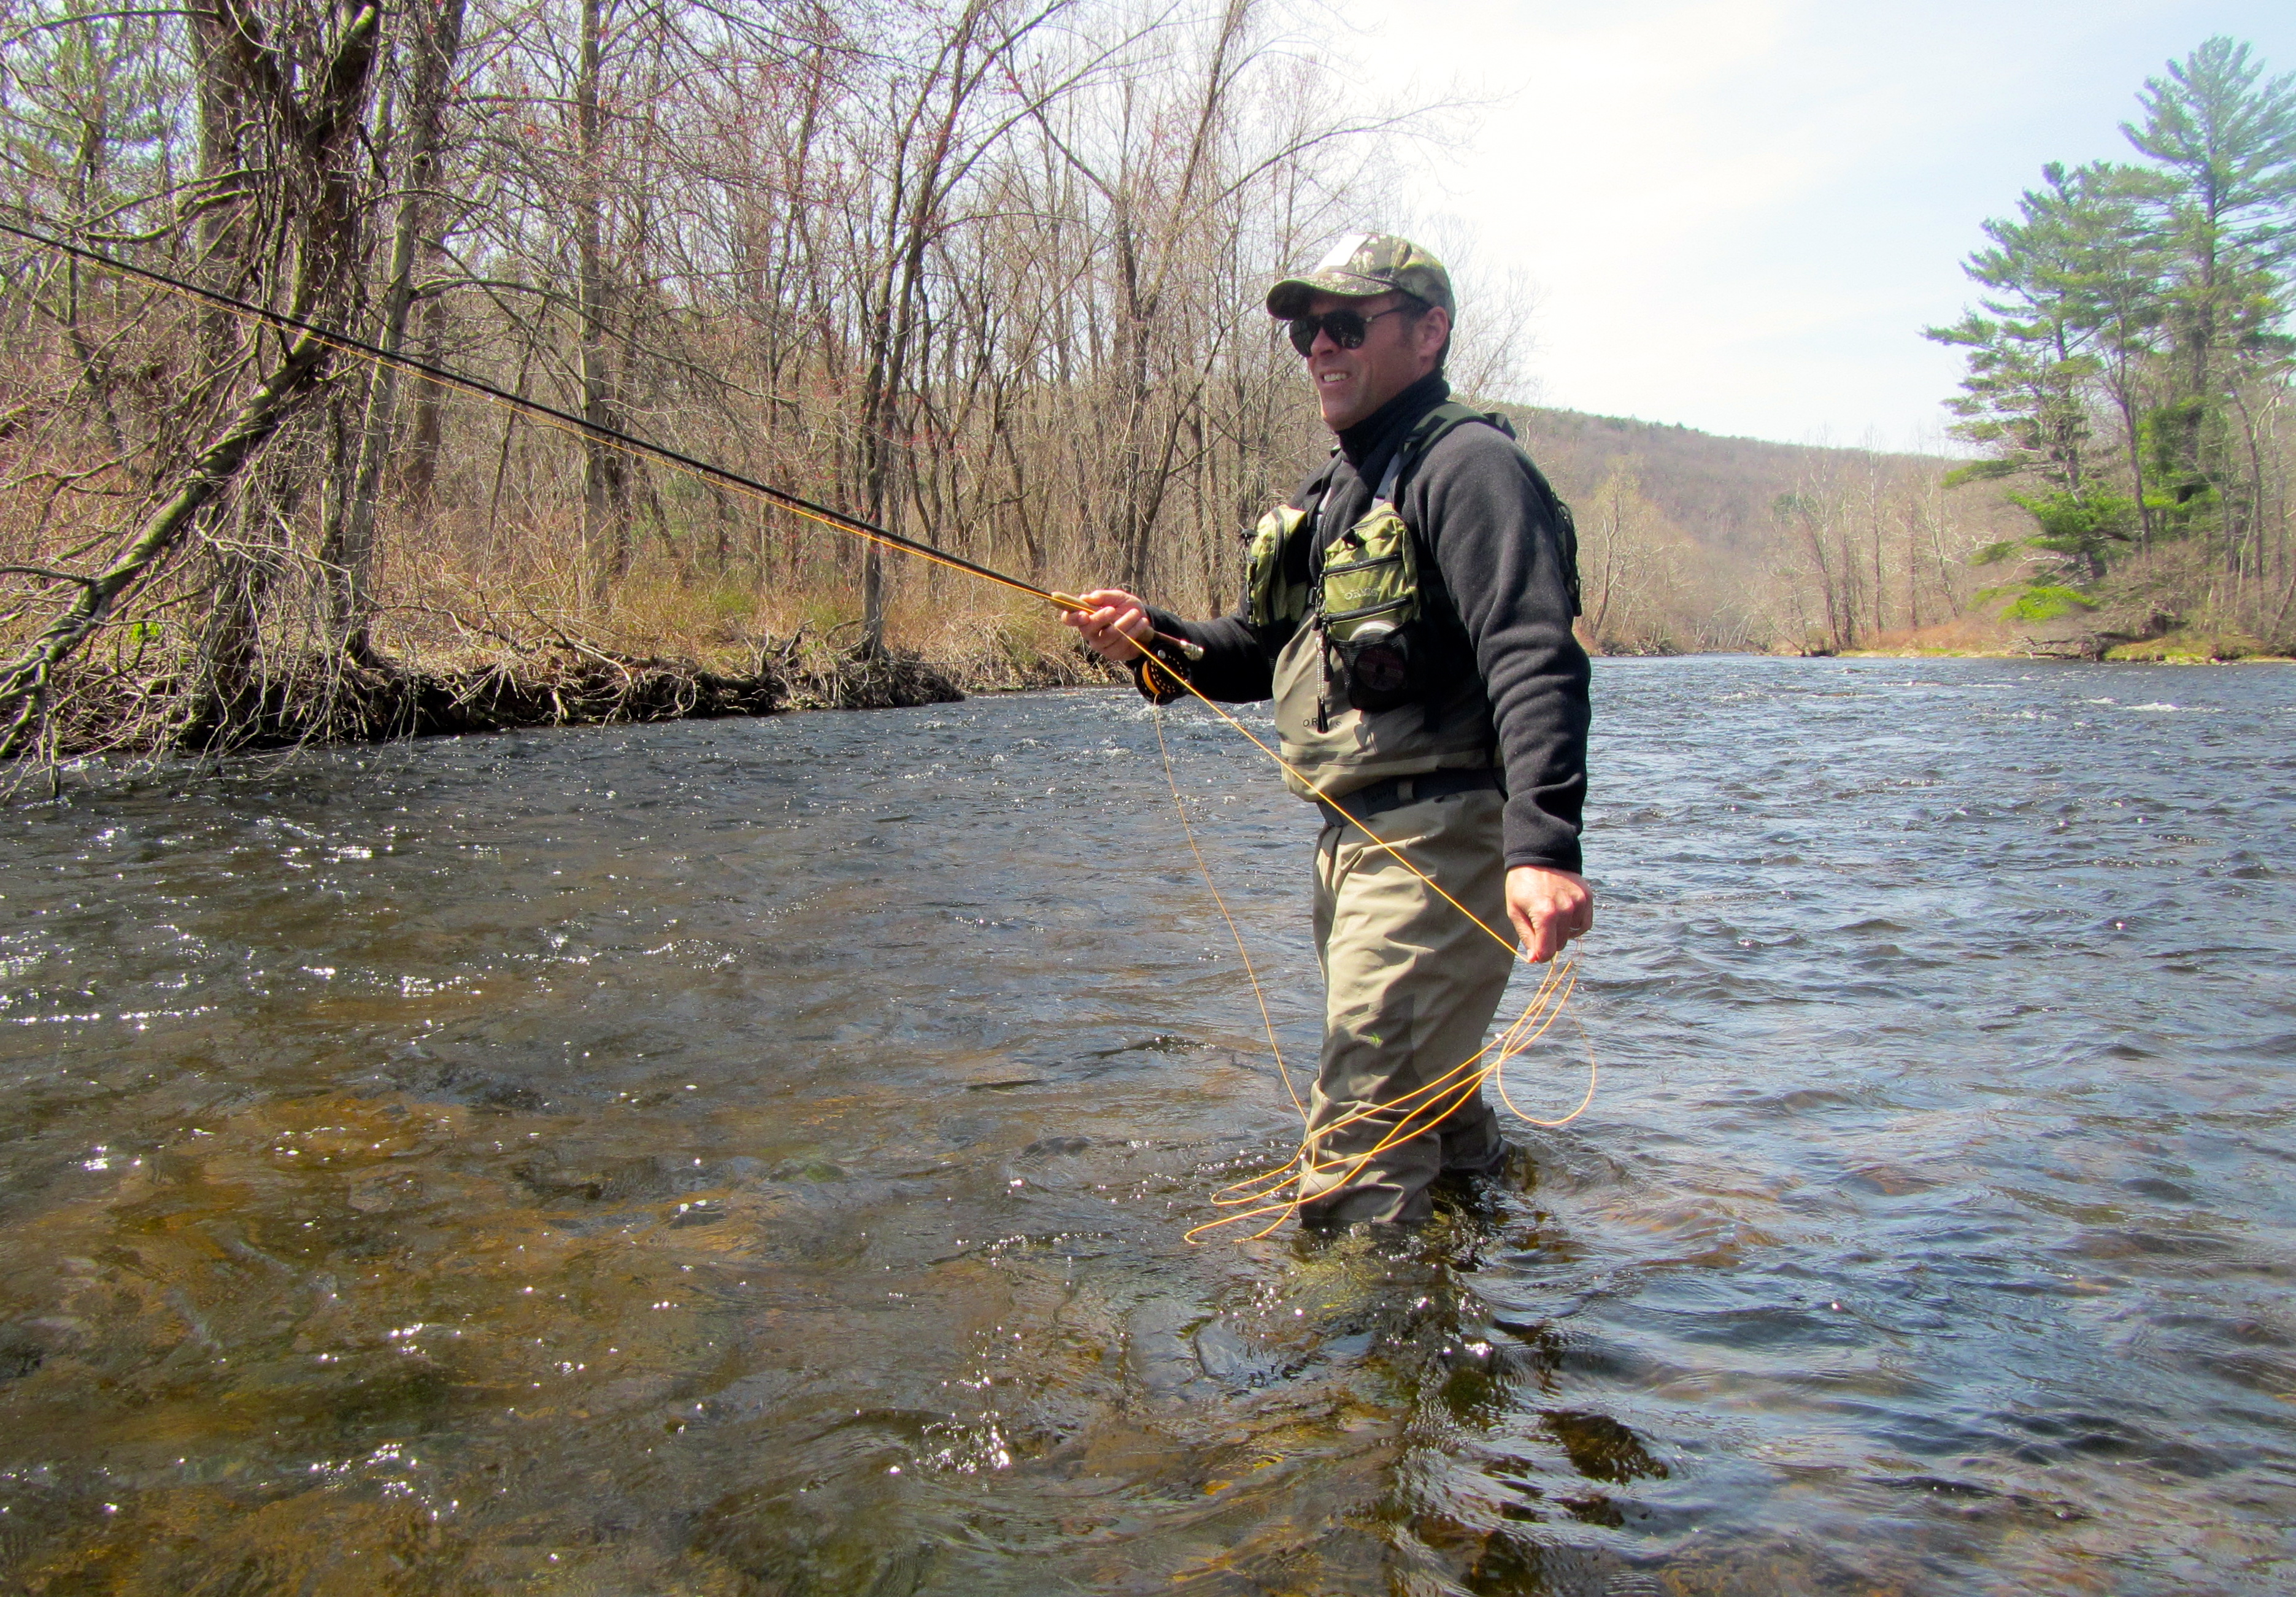 Farmington river guide currentseams for Farmington river fishing